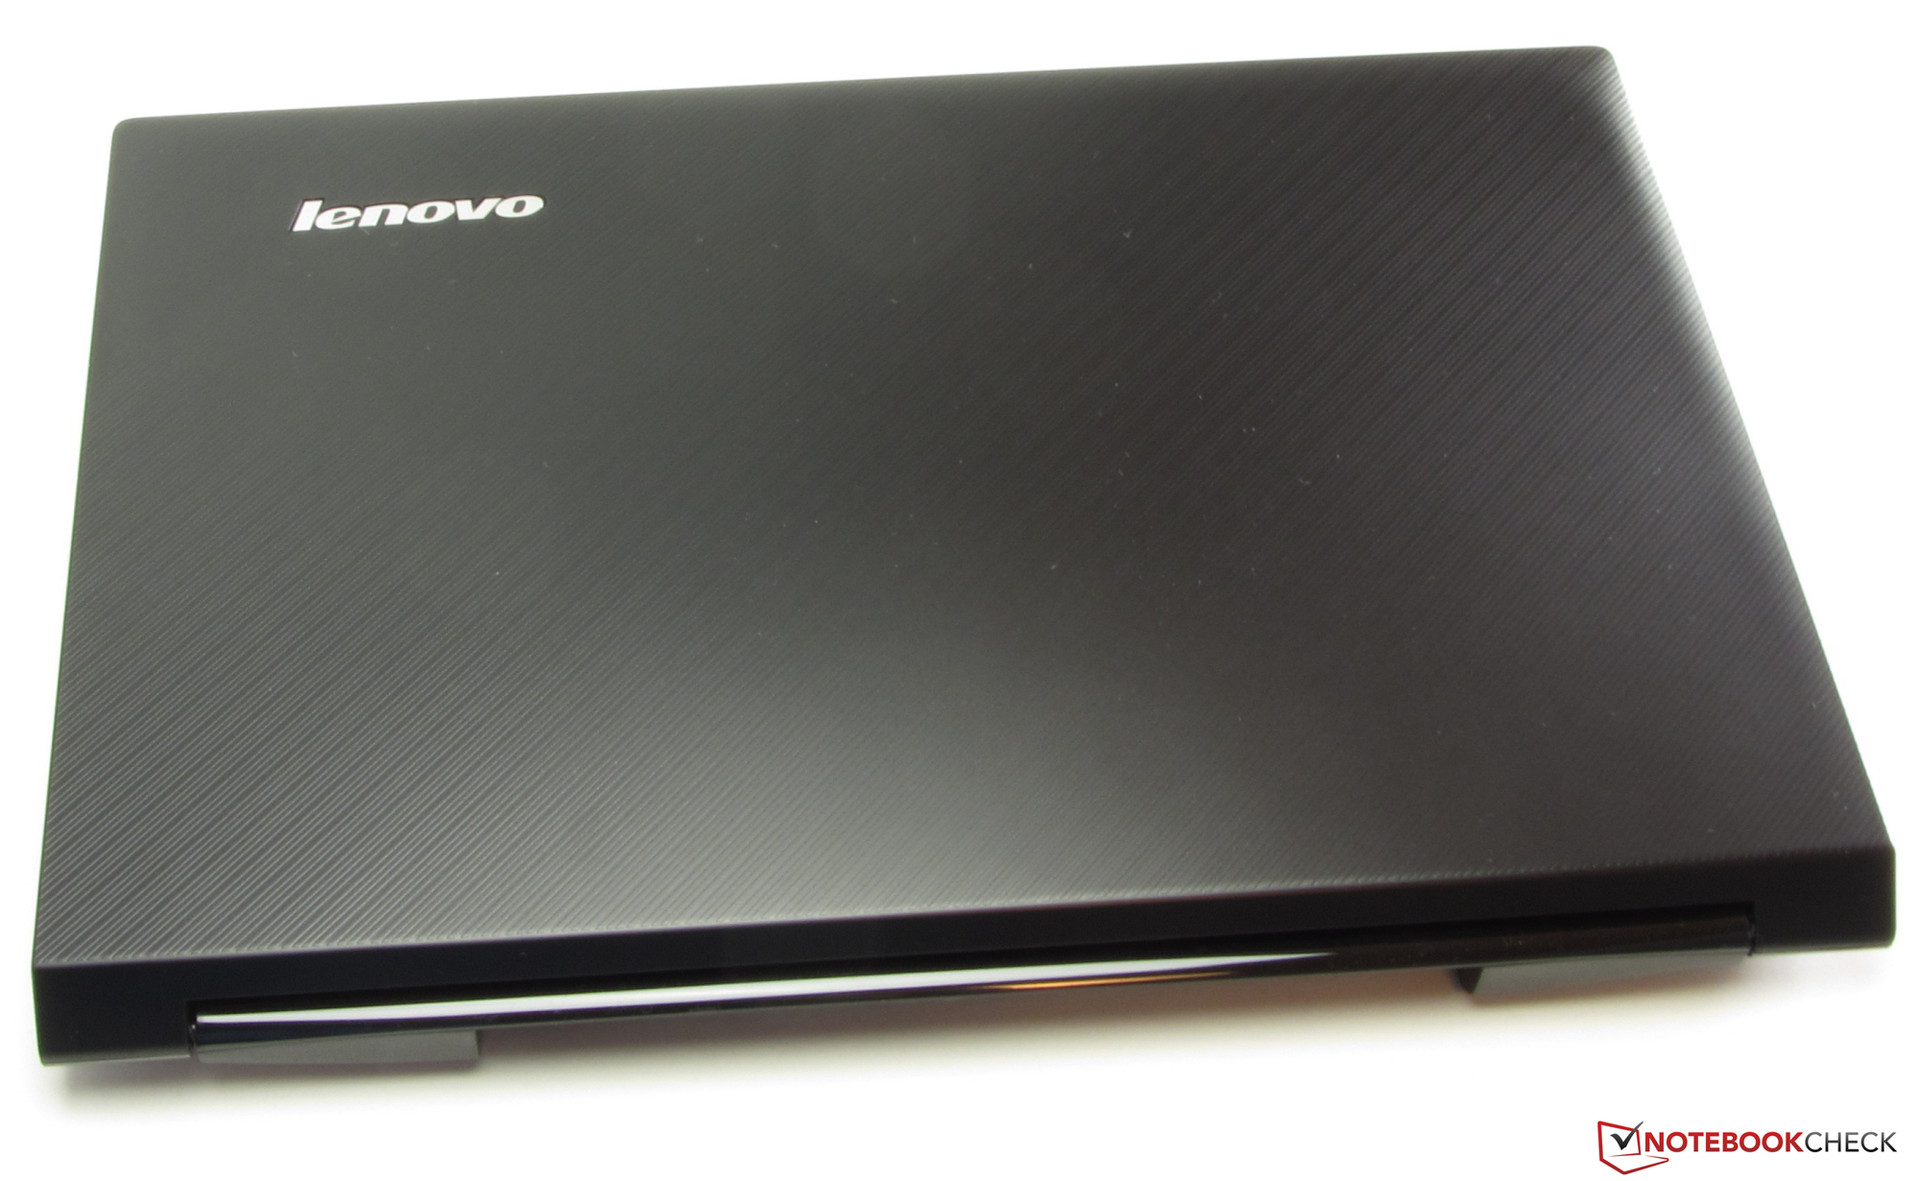 Review Lenovo B580-M94A5GE Notebook - NotebookCheck net Reviews